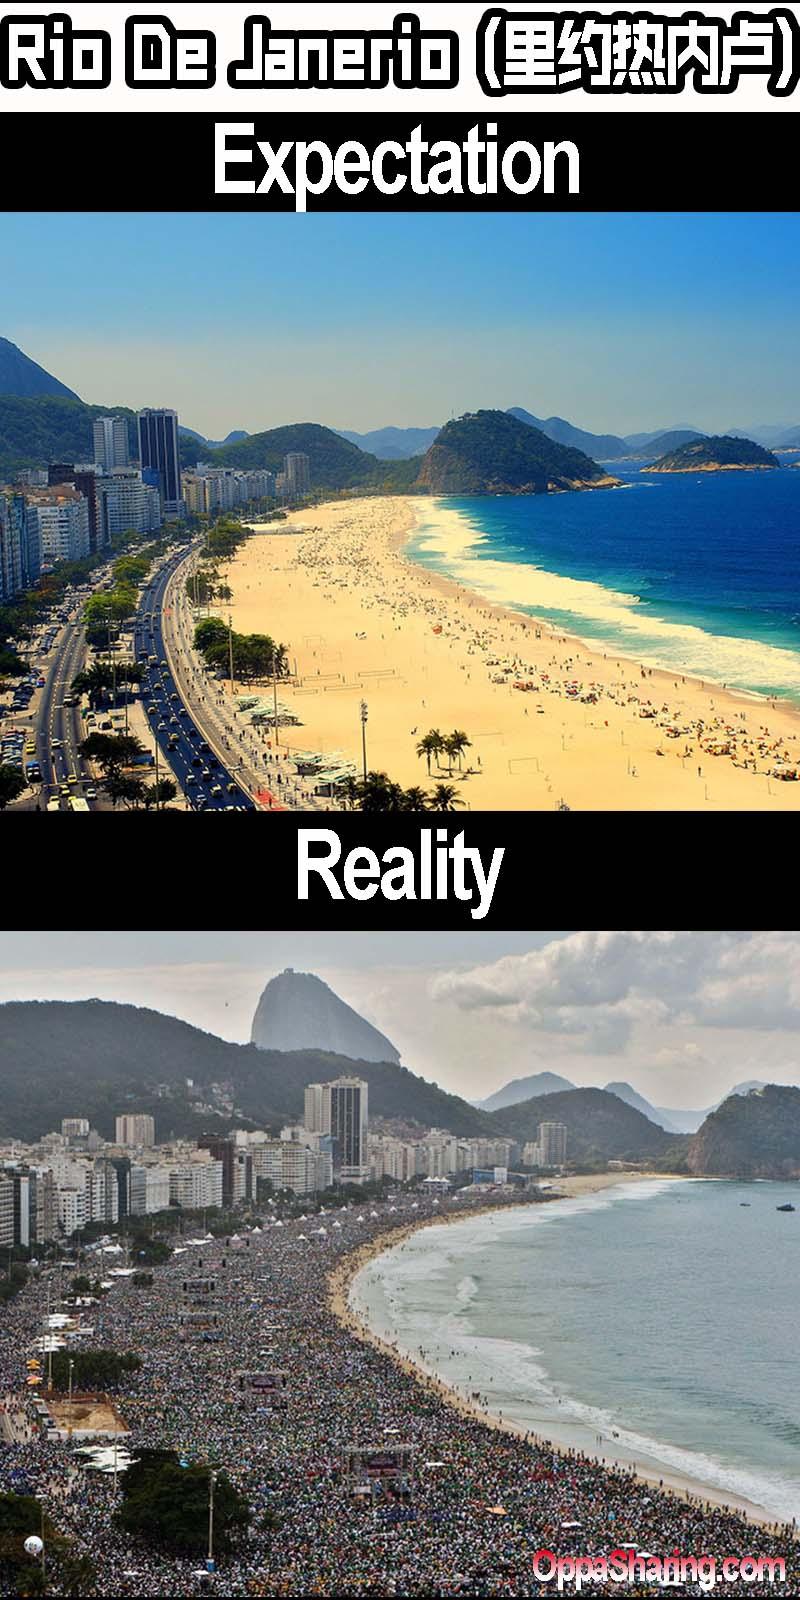 里约热内卢 Rio de janerio